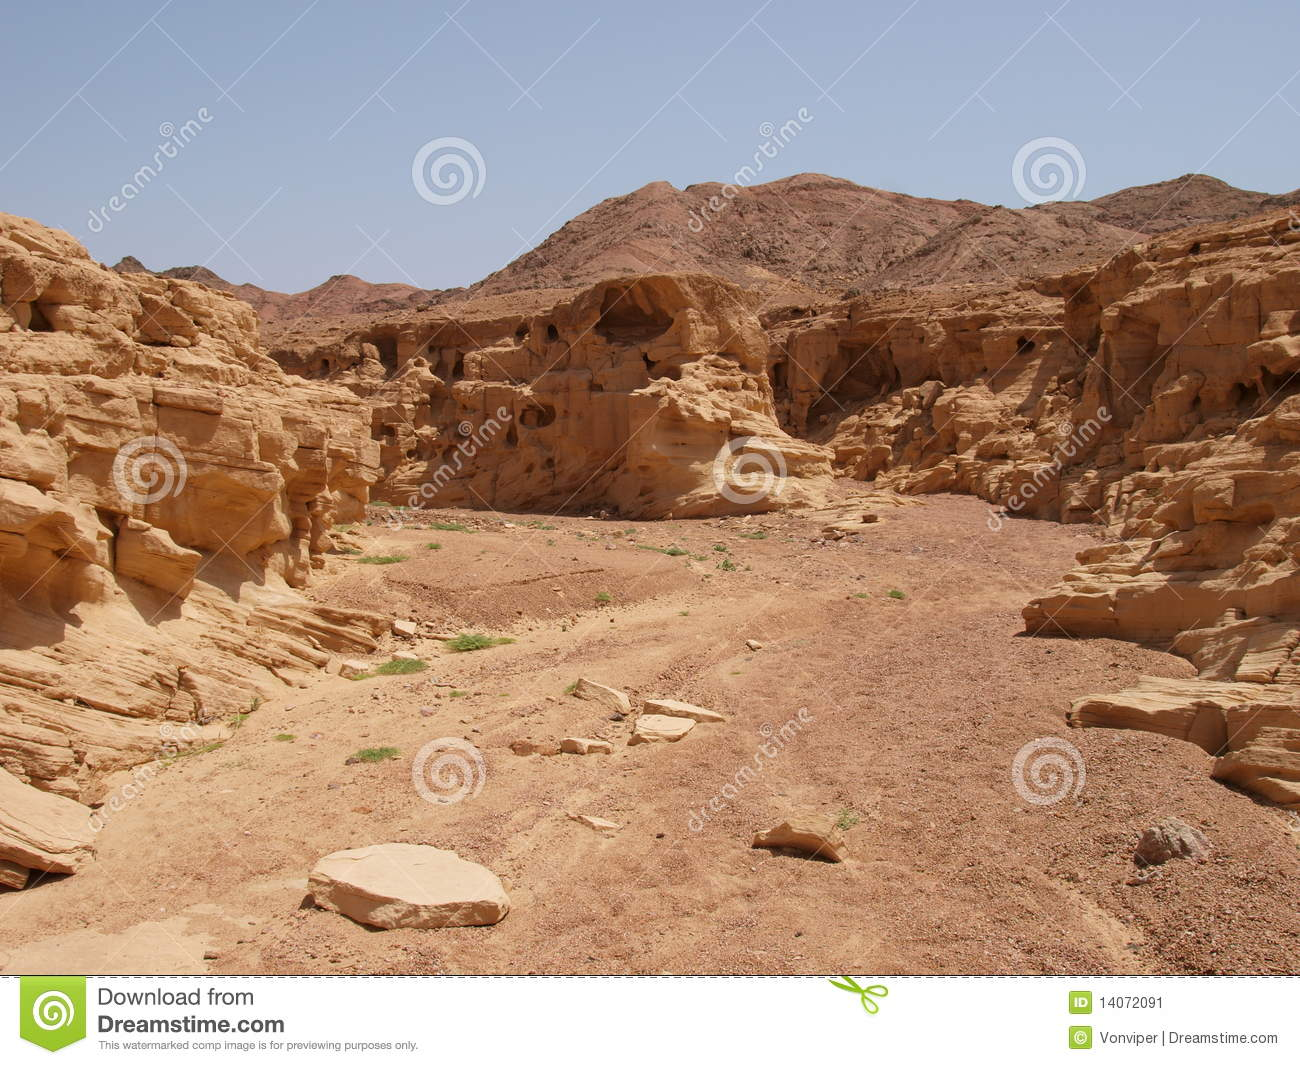 Sinai Peninsula clipart #17, Download drawings